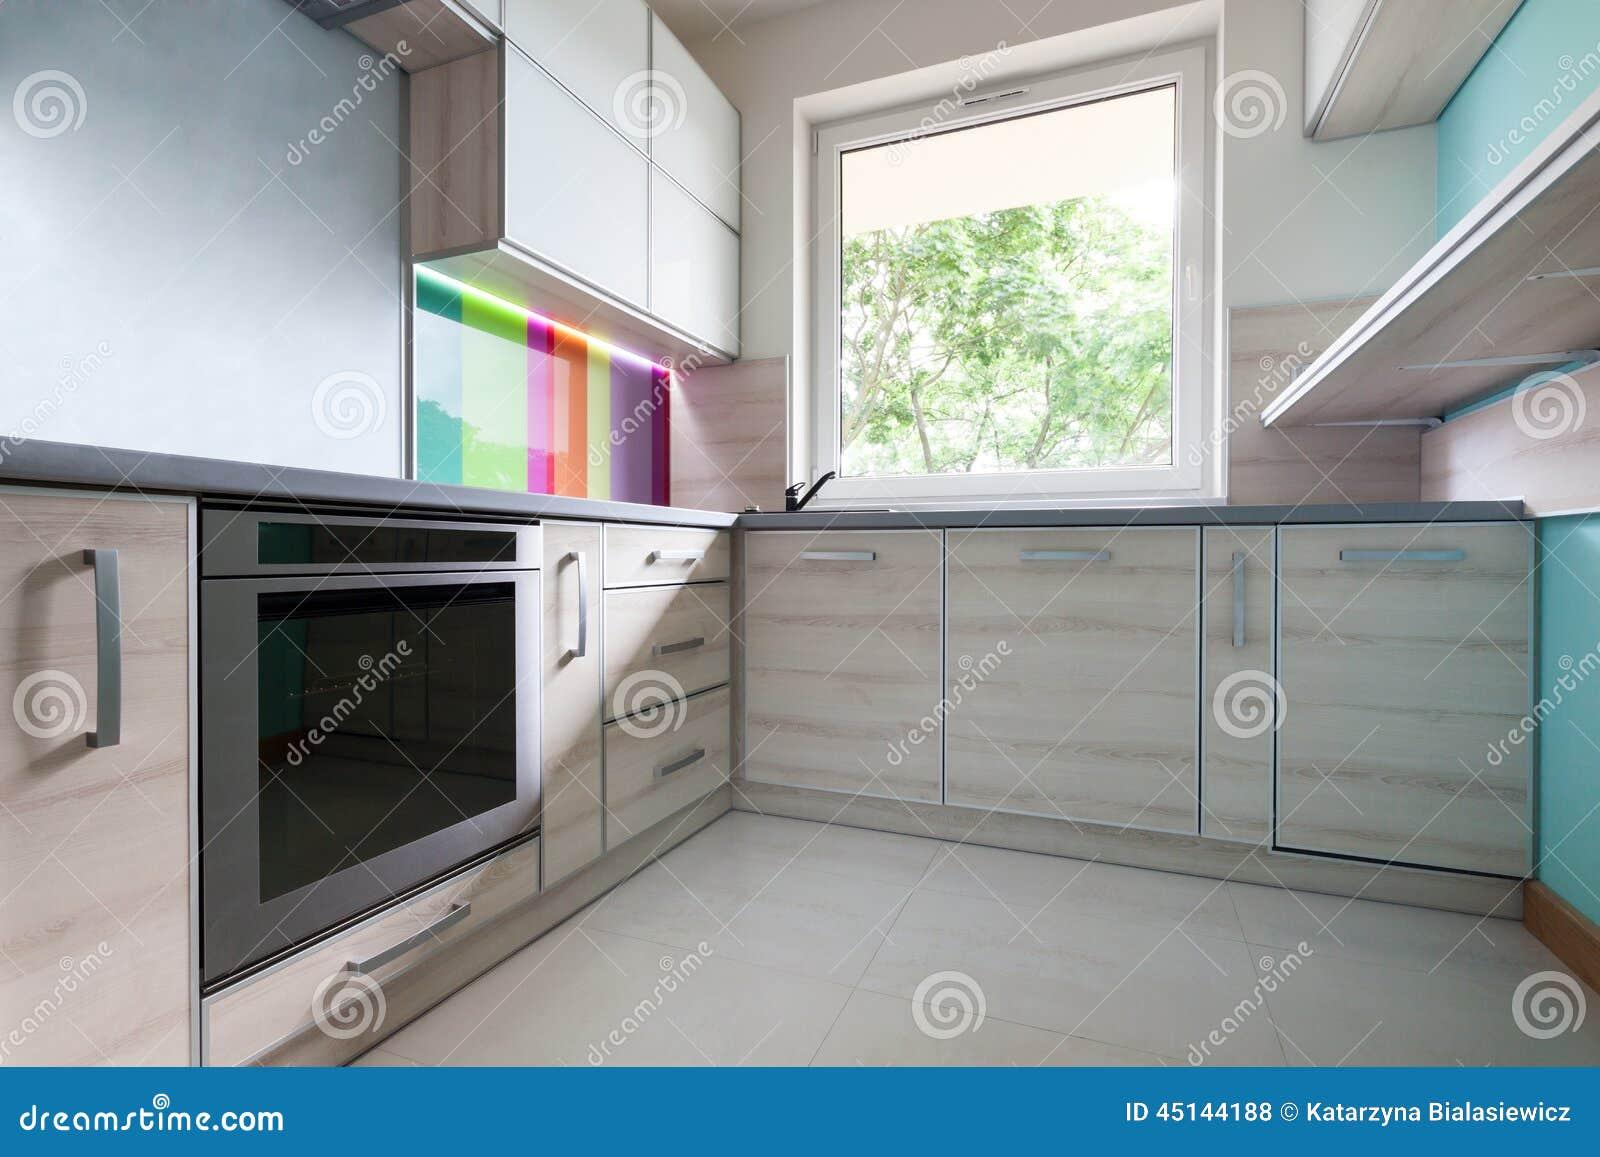 cuisine color e lumineuse moderne photo stock image du maison d corer 45144188. Black Bedroom Furniture Sets. Home Design Ideas